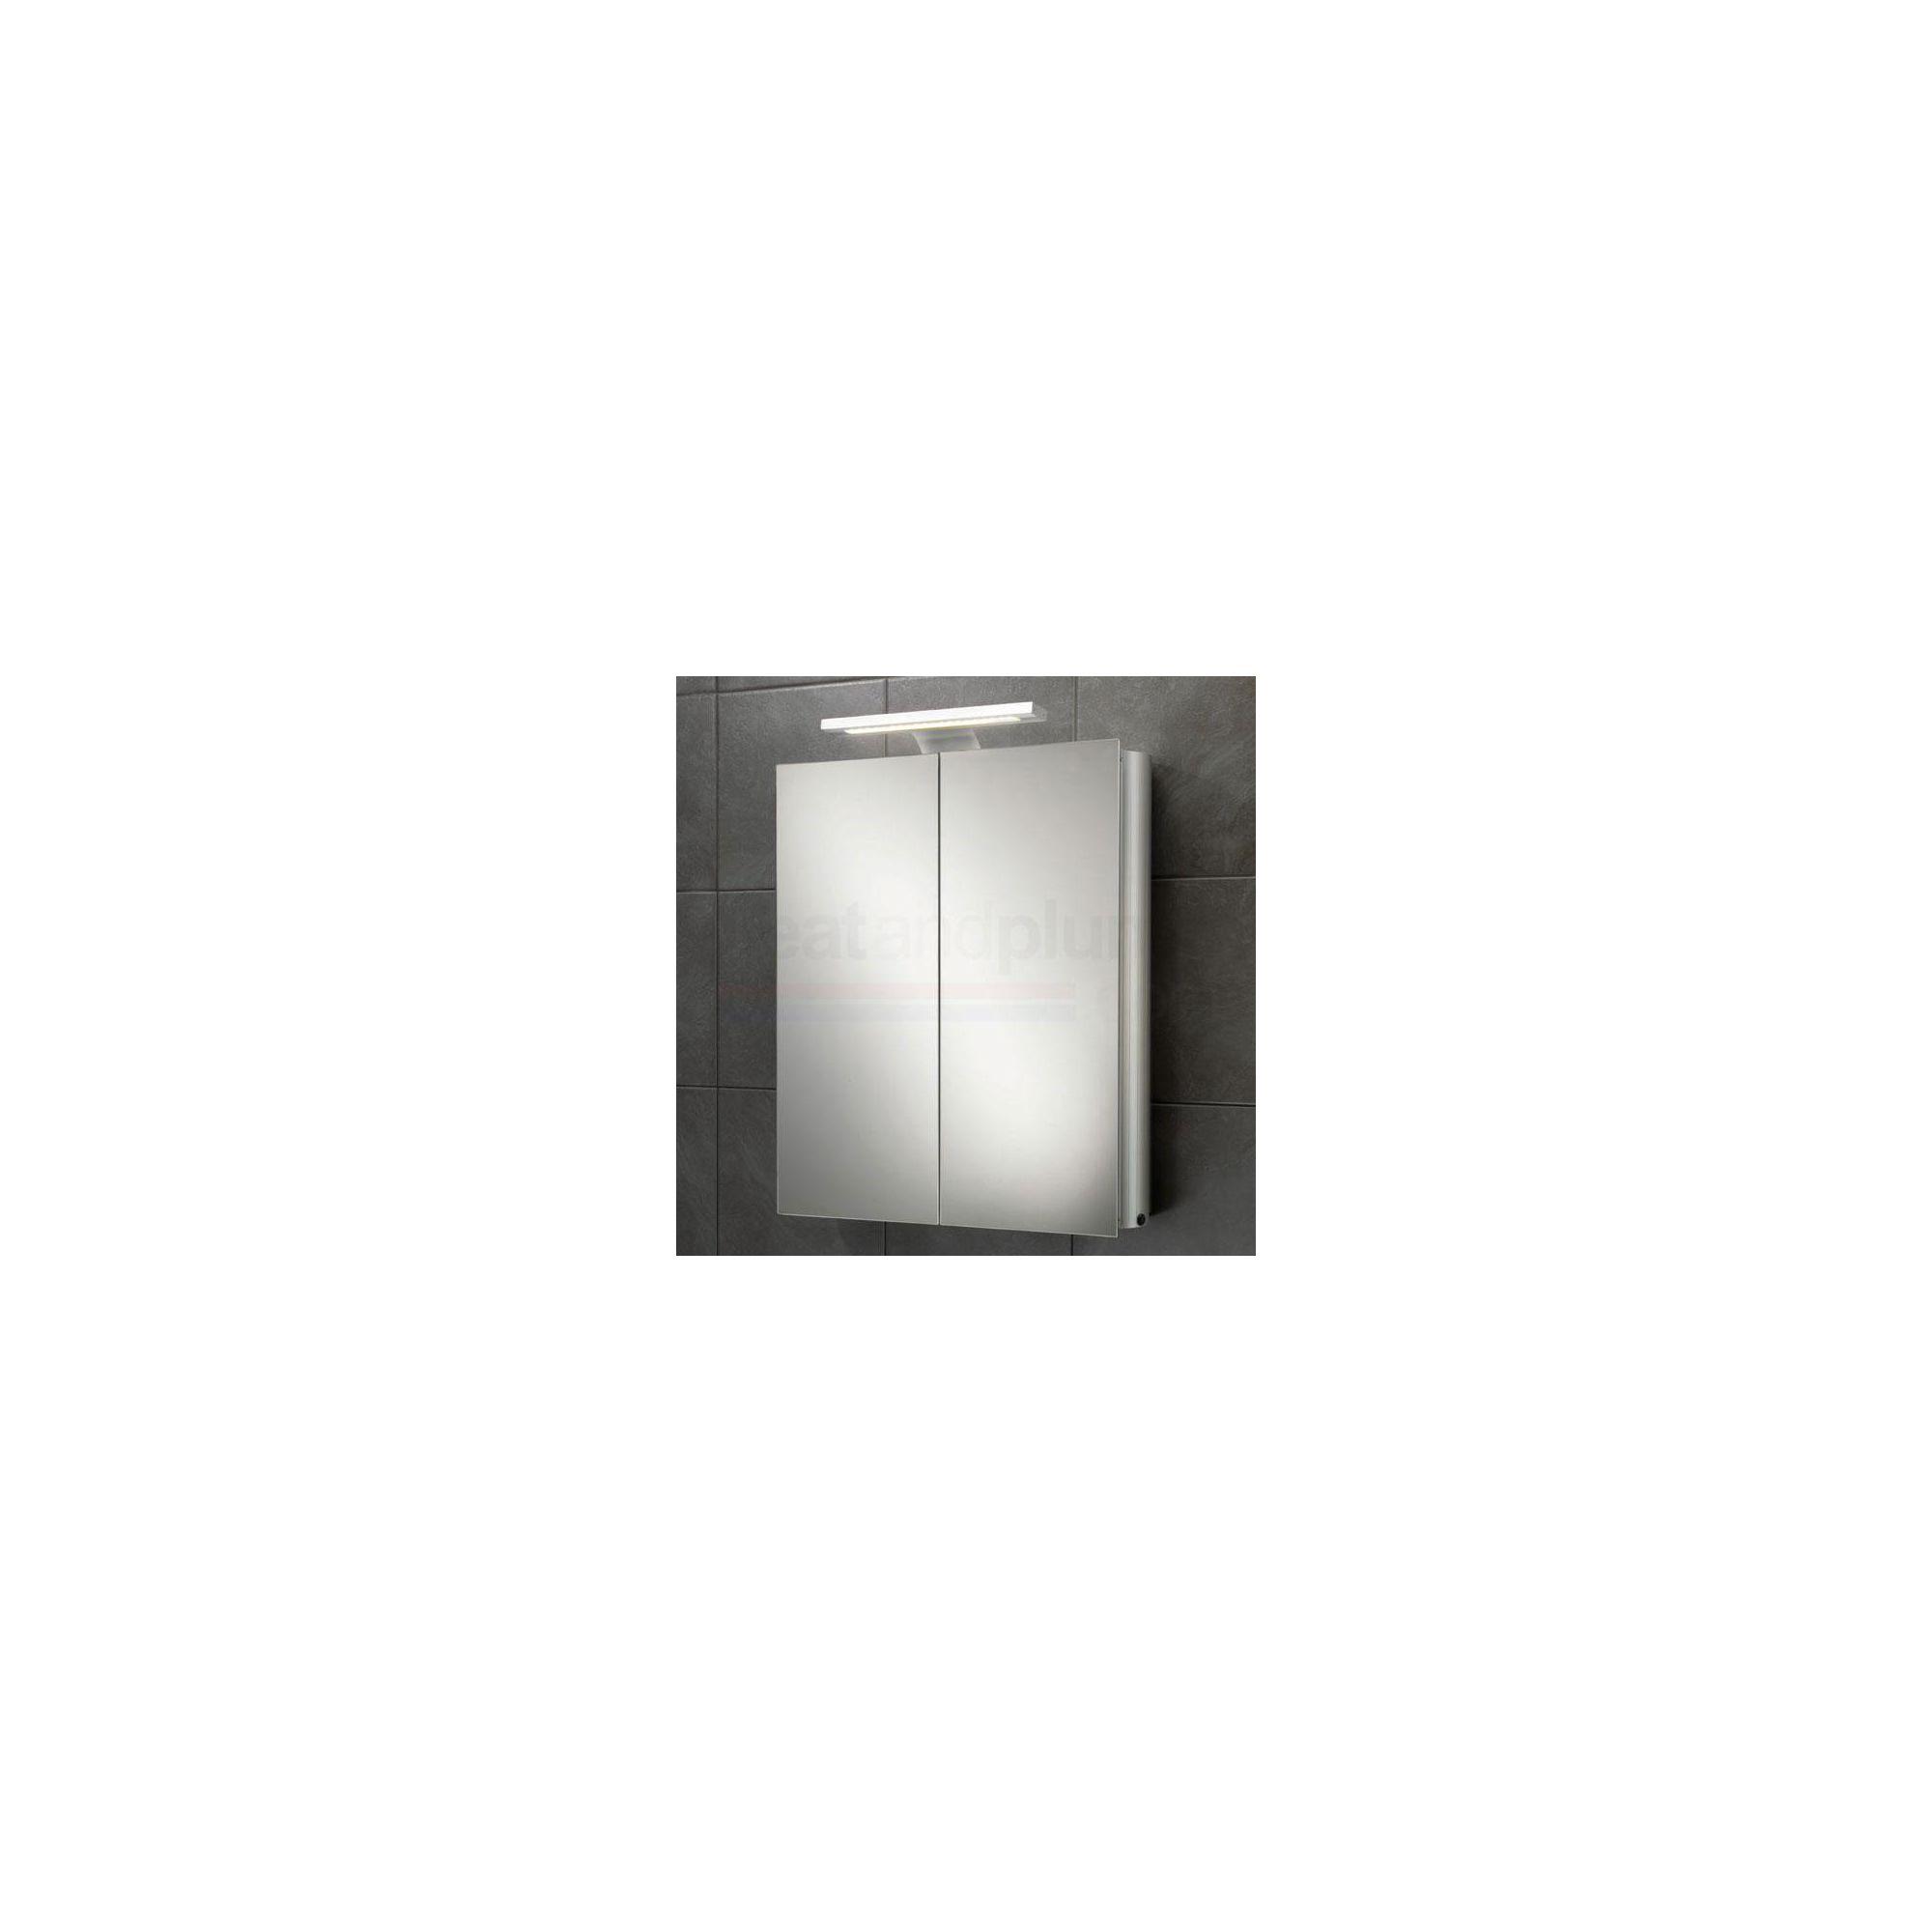 HiB Atomic Aluminium Bathroom Cabinet 700/750mm High x 600mm Wide x 145mm Deep